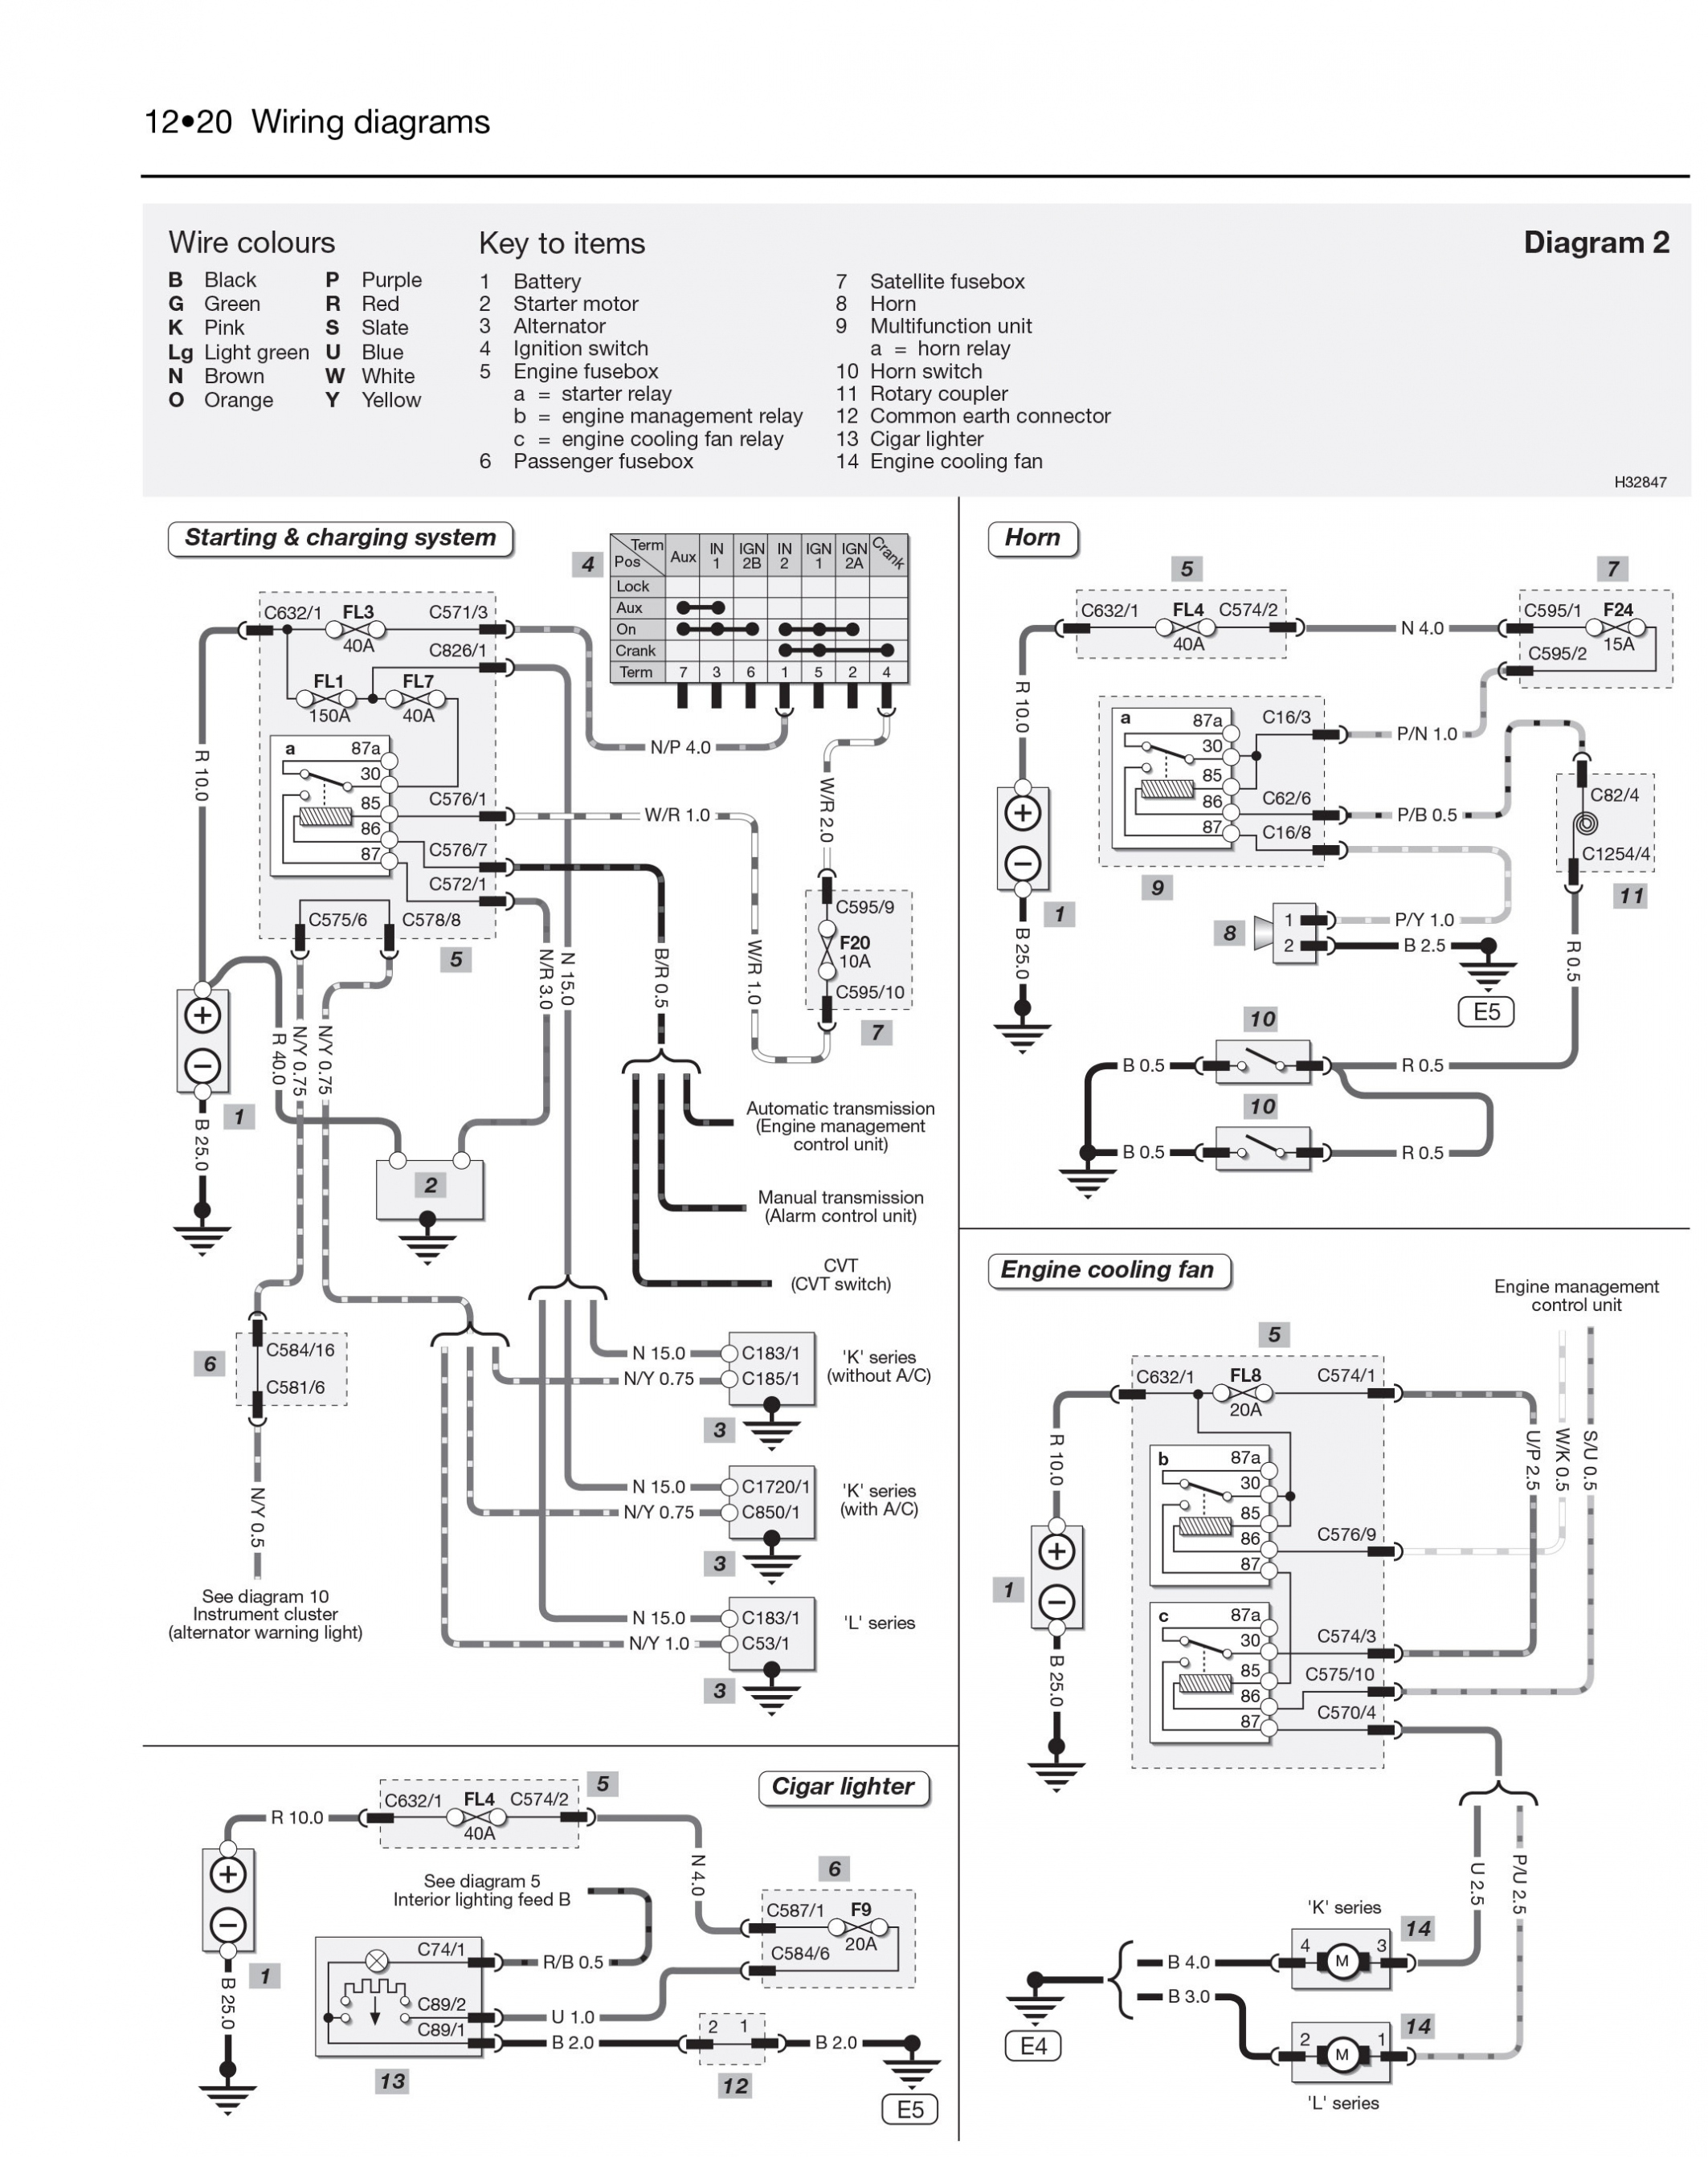 Mgb Wiring Diagram | Wiring Library - Mg Wiring Diagram